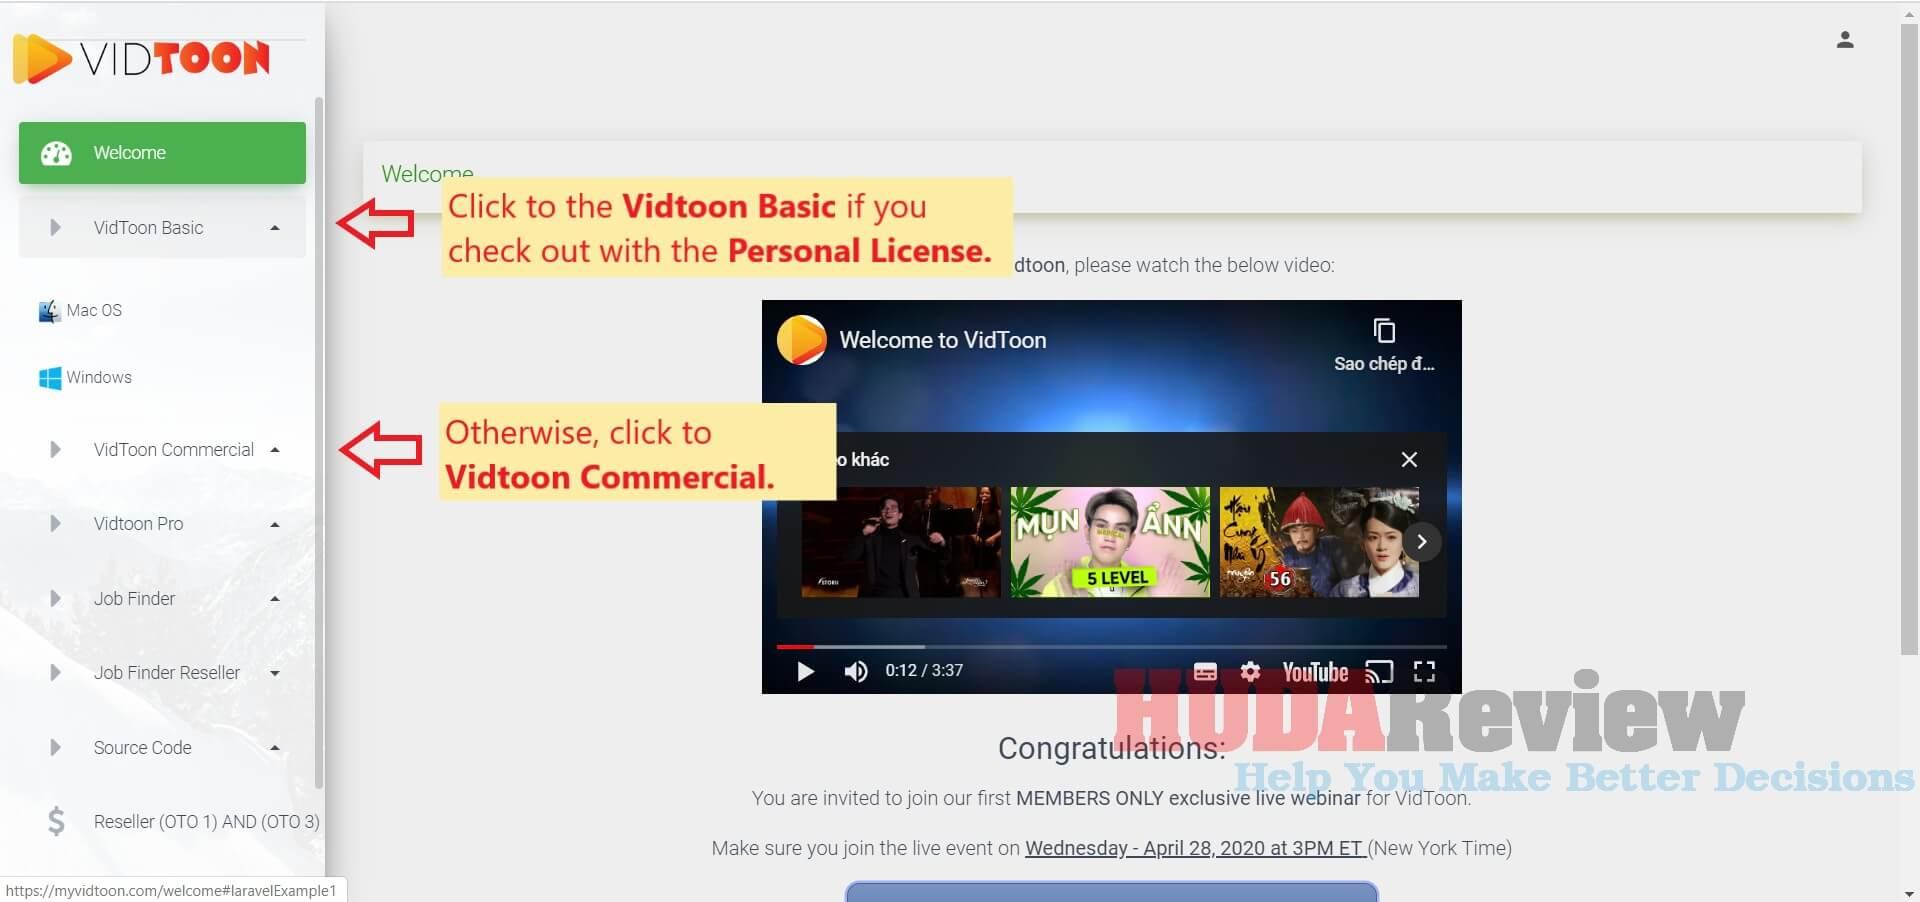 VidToon-Step-1-2